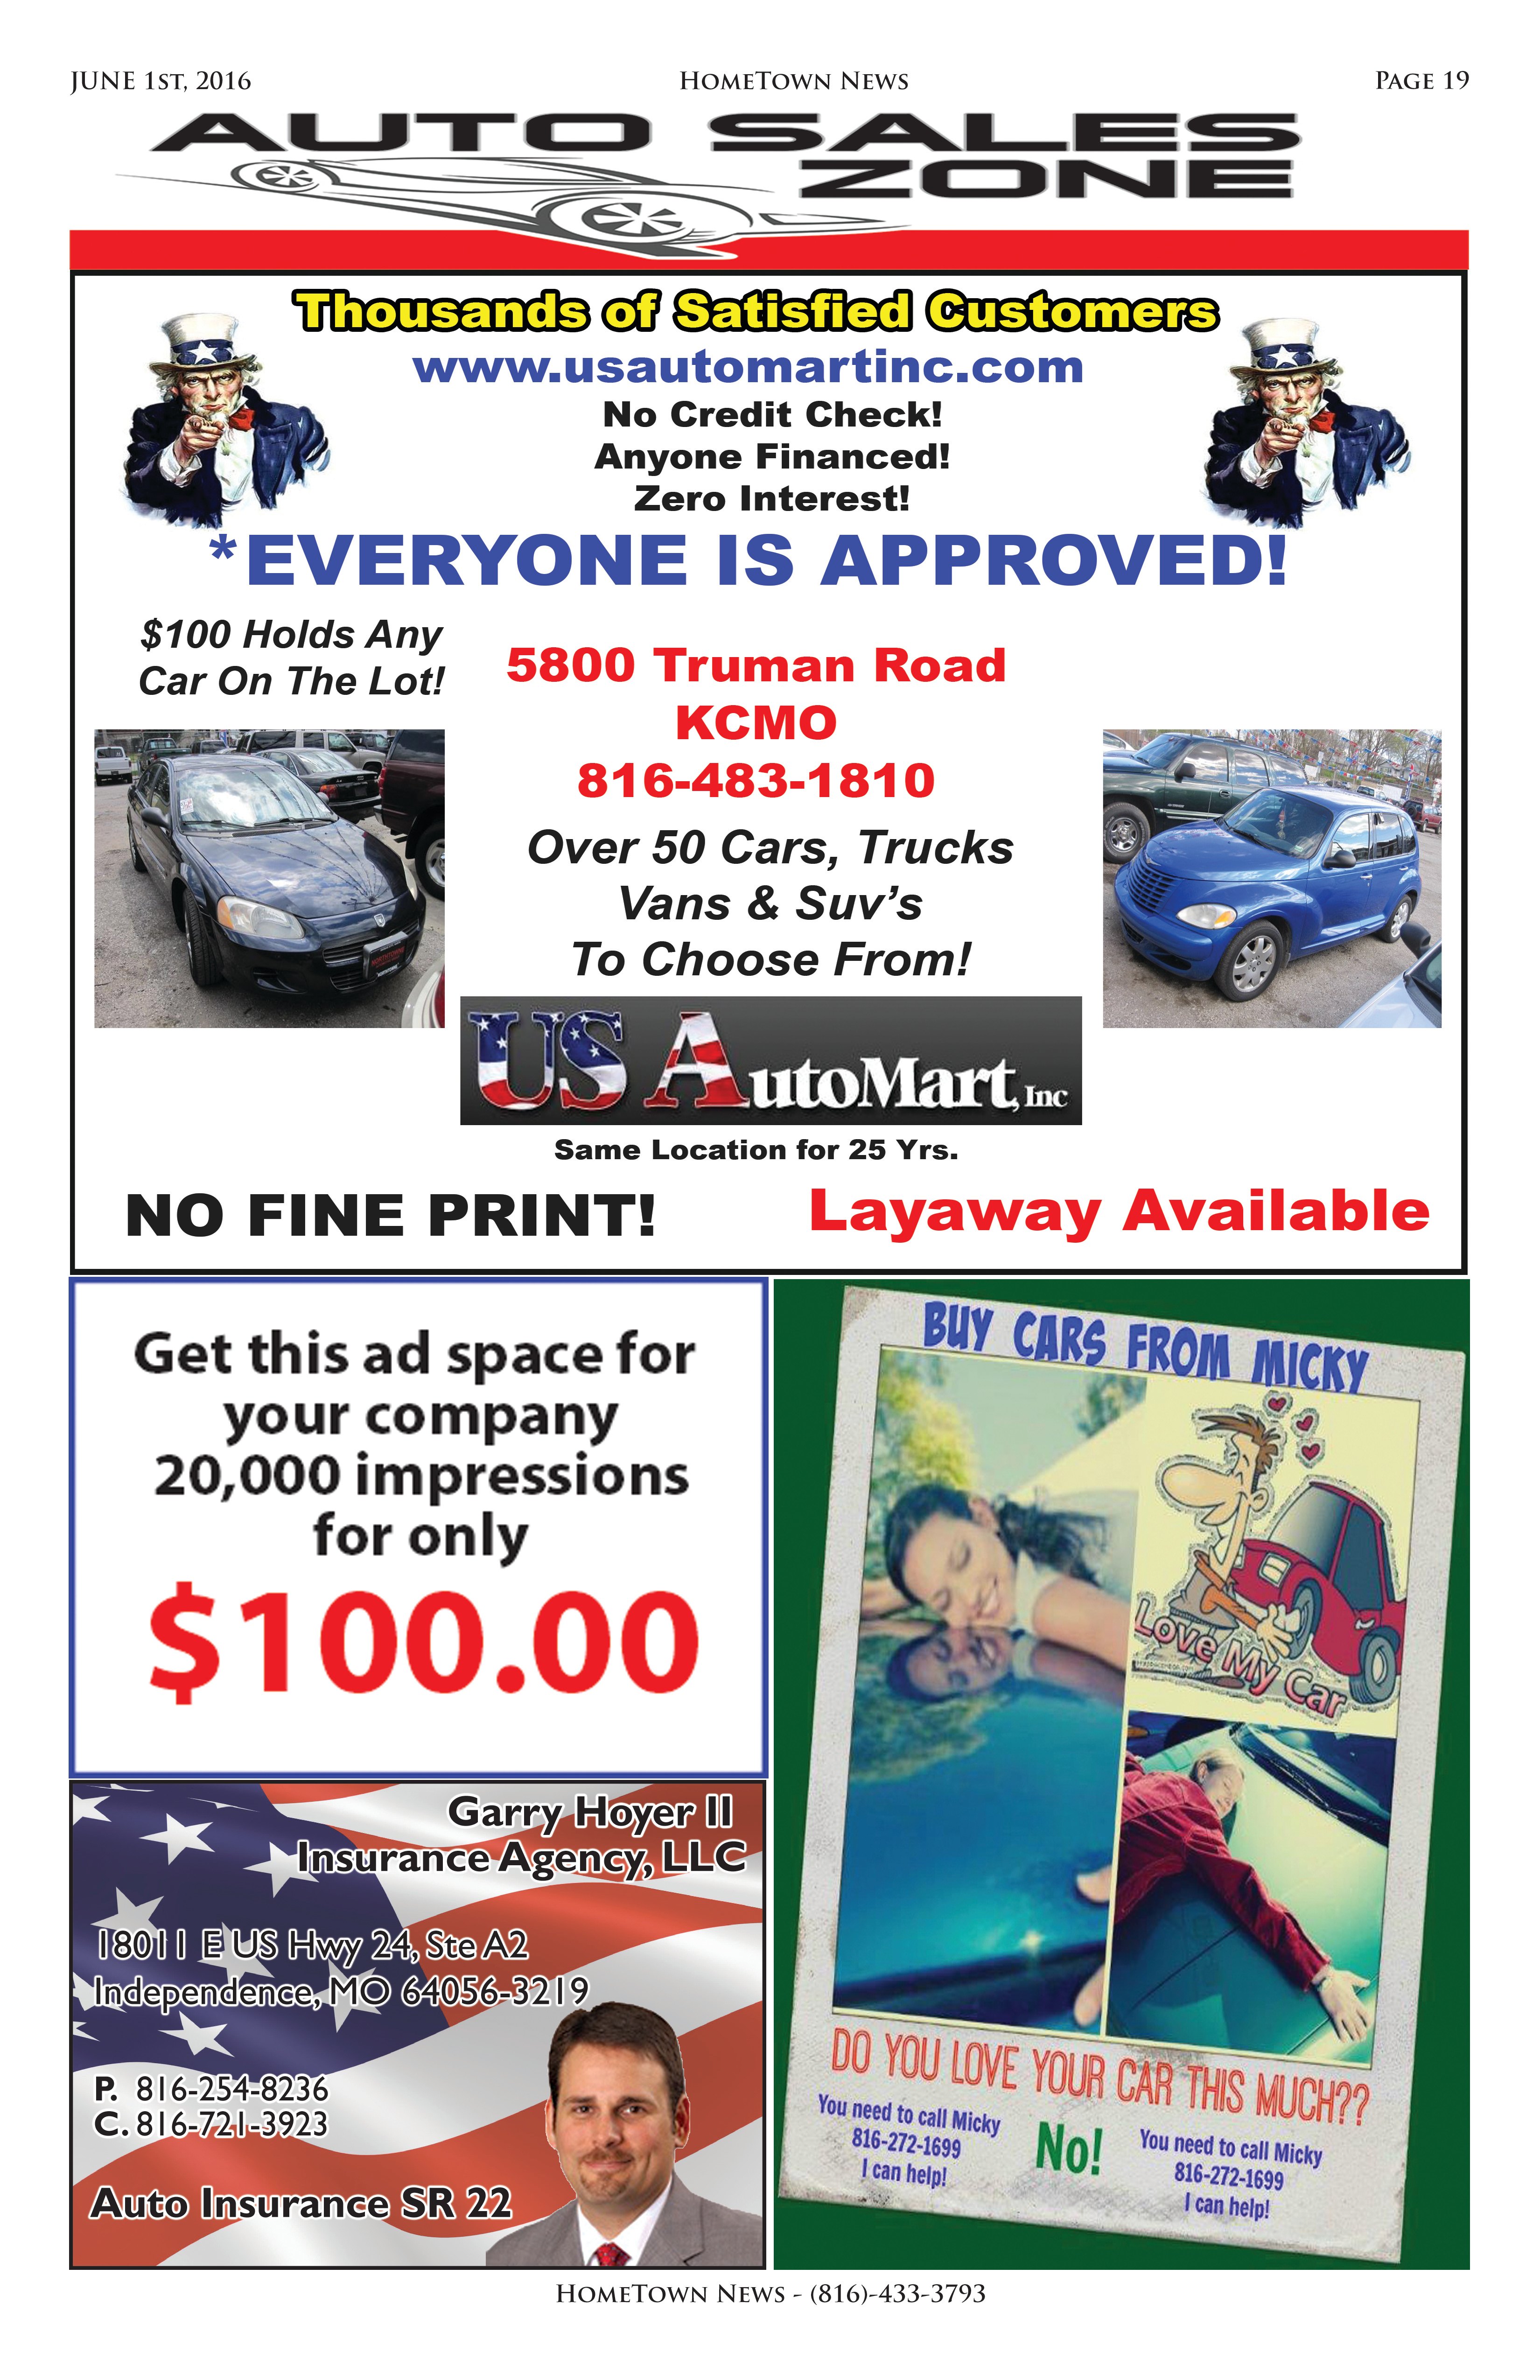 HTN11 - 19 - Auto Sales